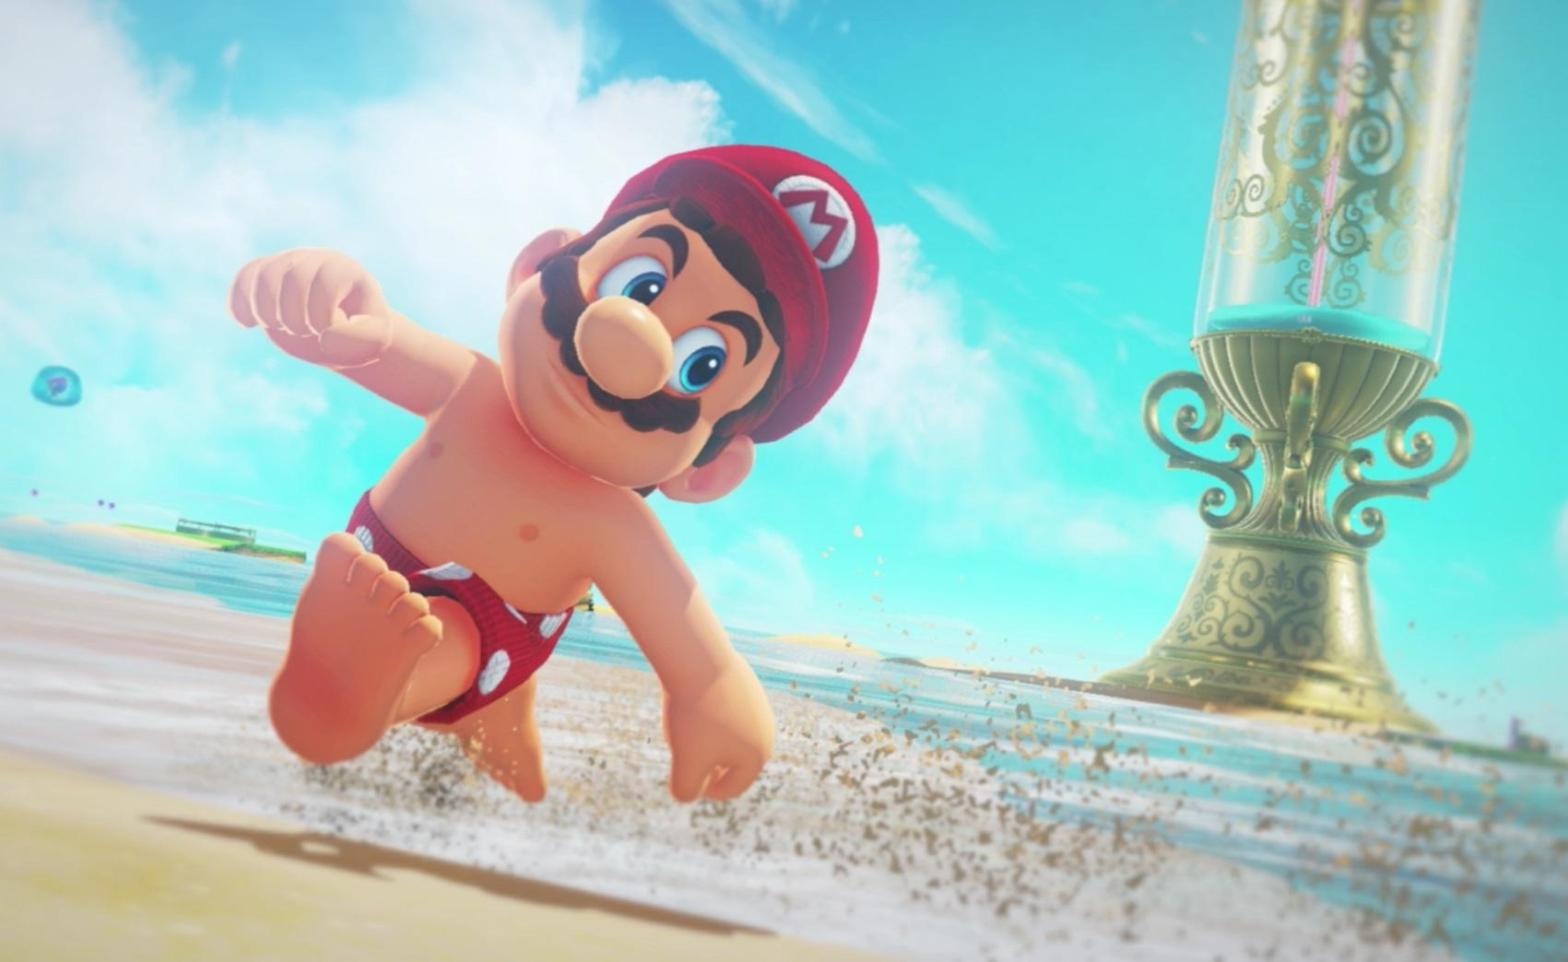 Super Mario Odyssey, Games, Online Games, Video Games